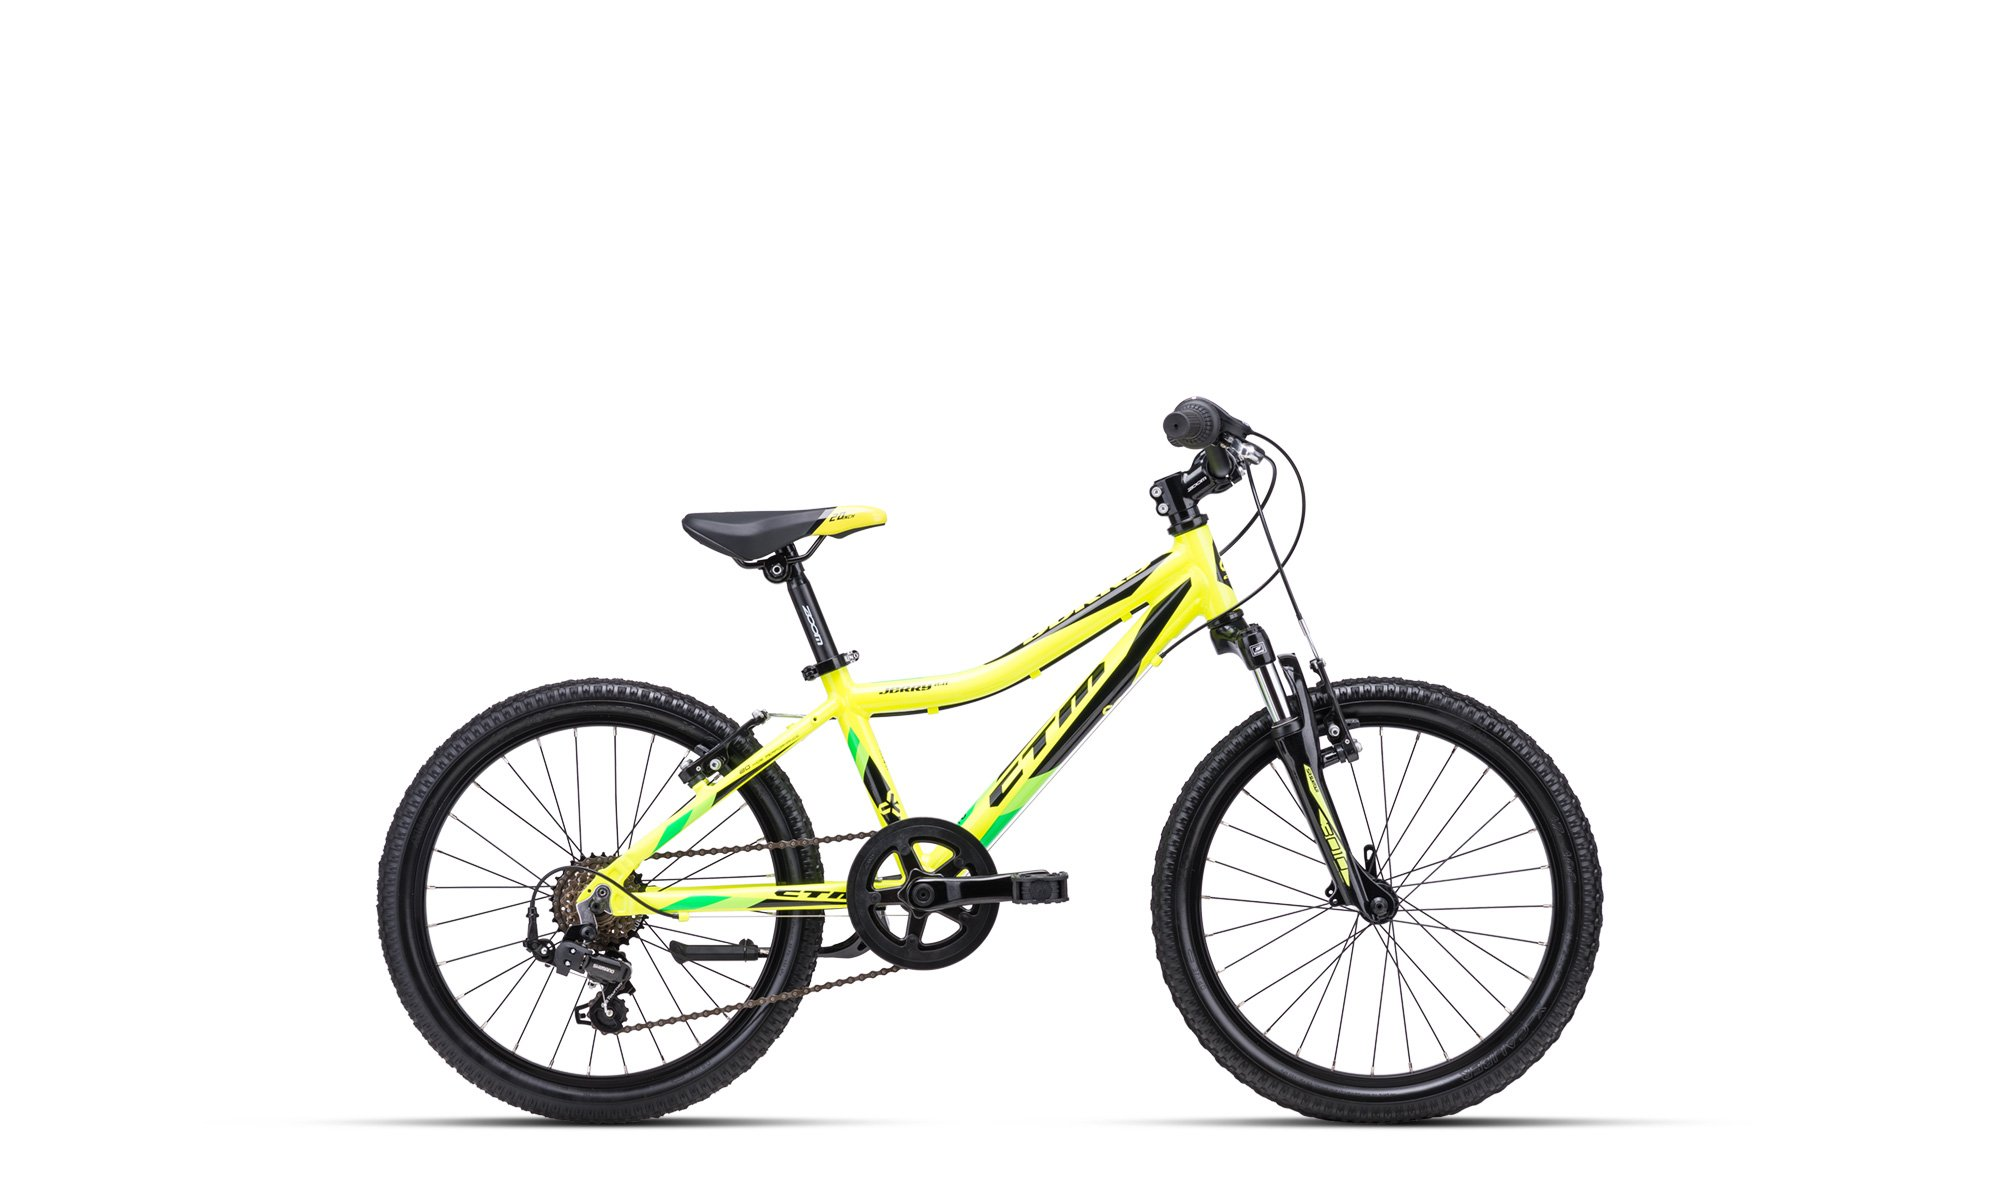 "Bērnu divritenis velosipēds CTM Kids 20"" Jerry 2.0"